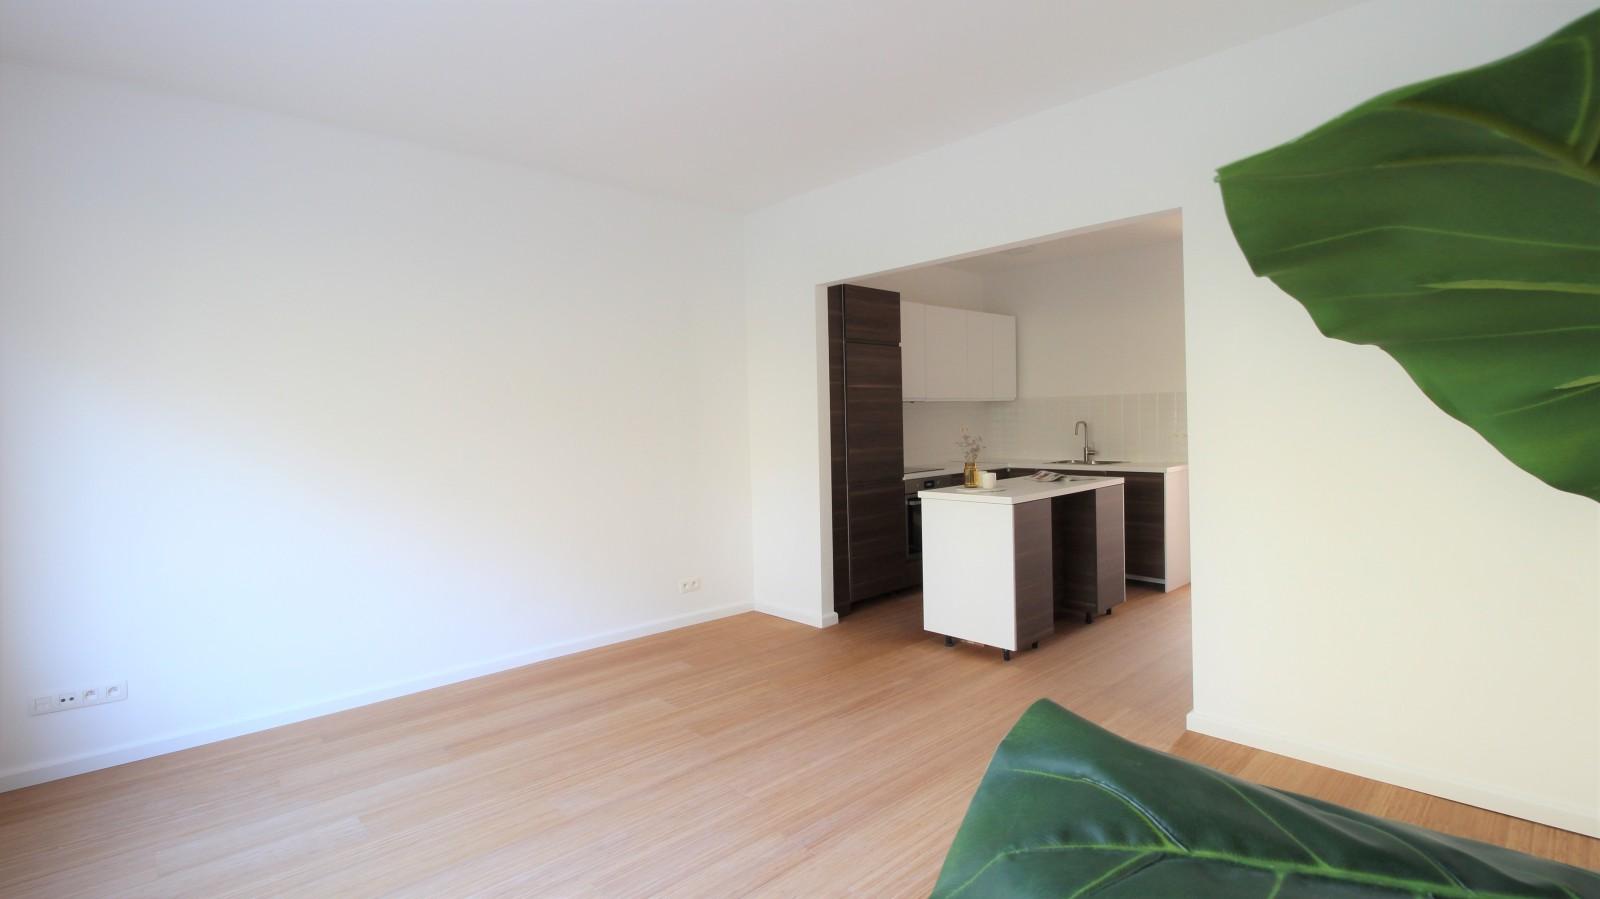 Gerenoveerd appartement met twee slaapkamers op centrale ligging te Mortsel! afbeelding 1